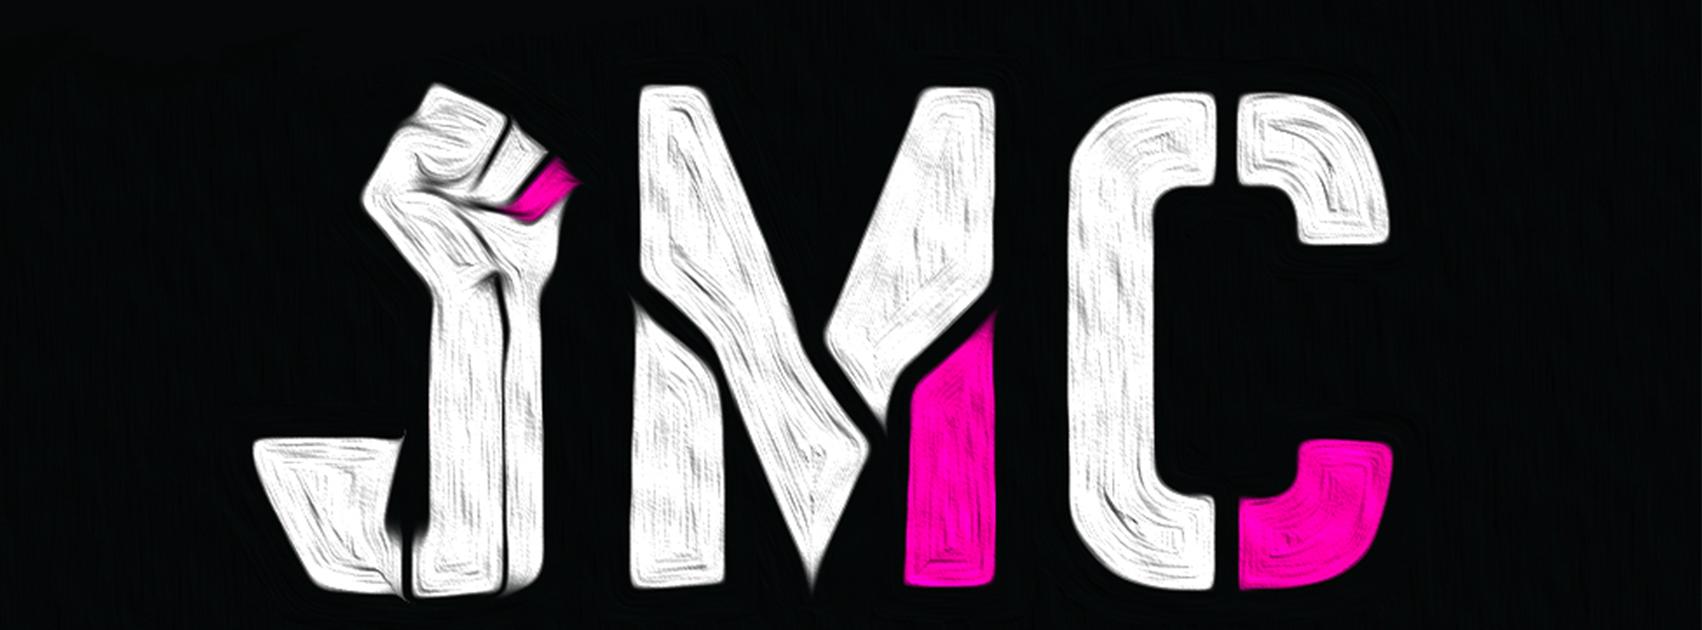 JMC.logo.jpg